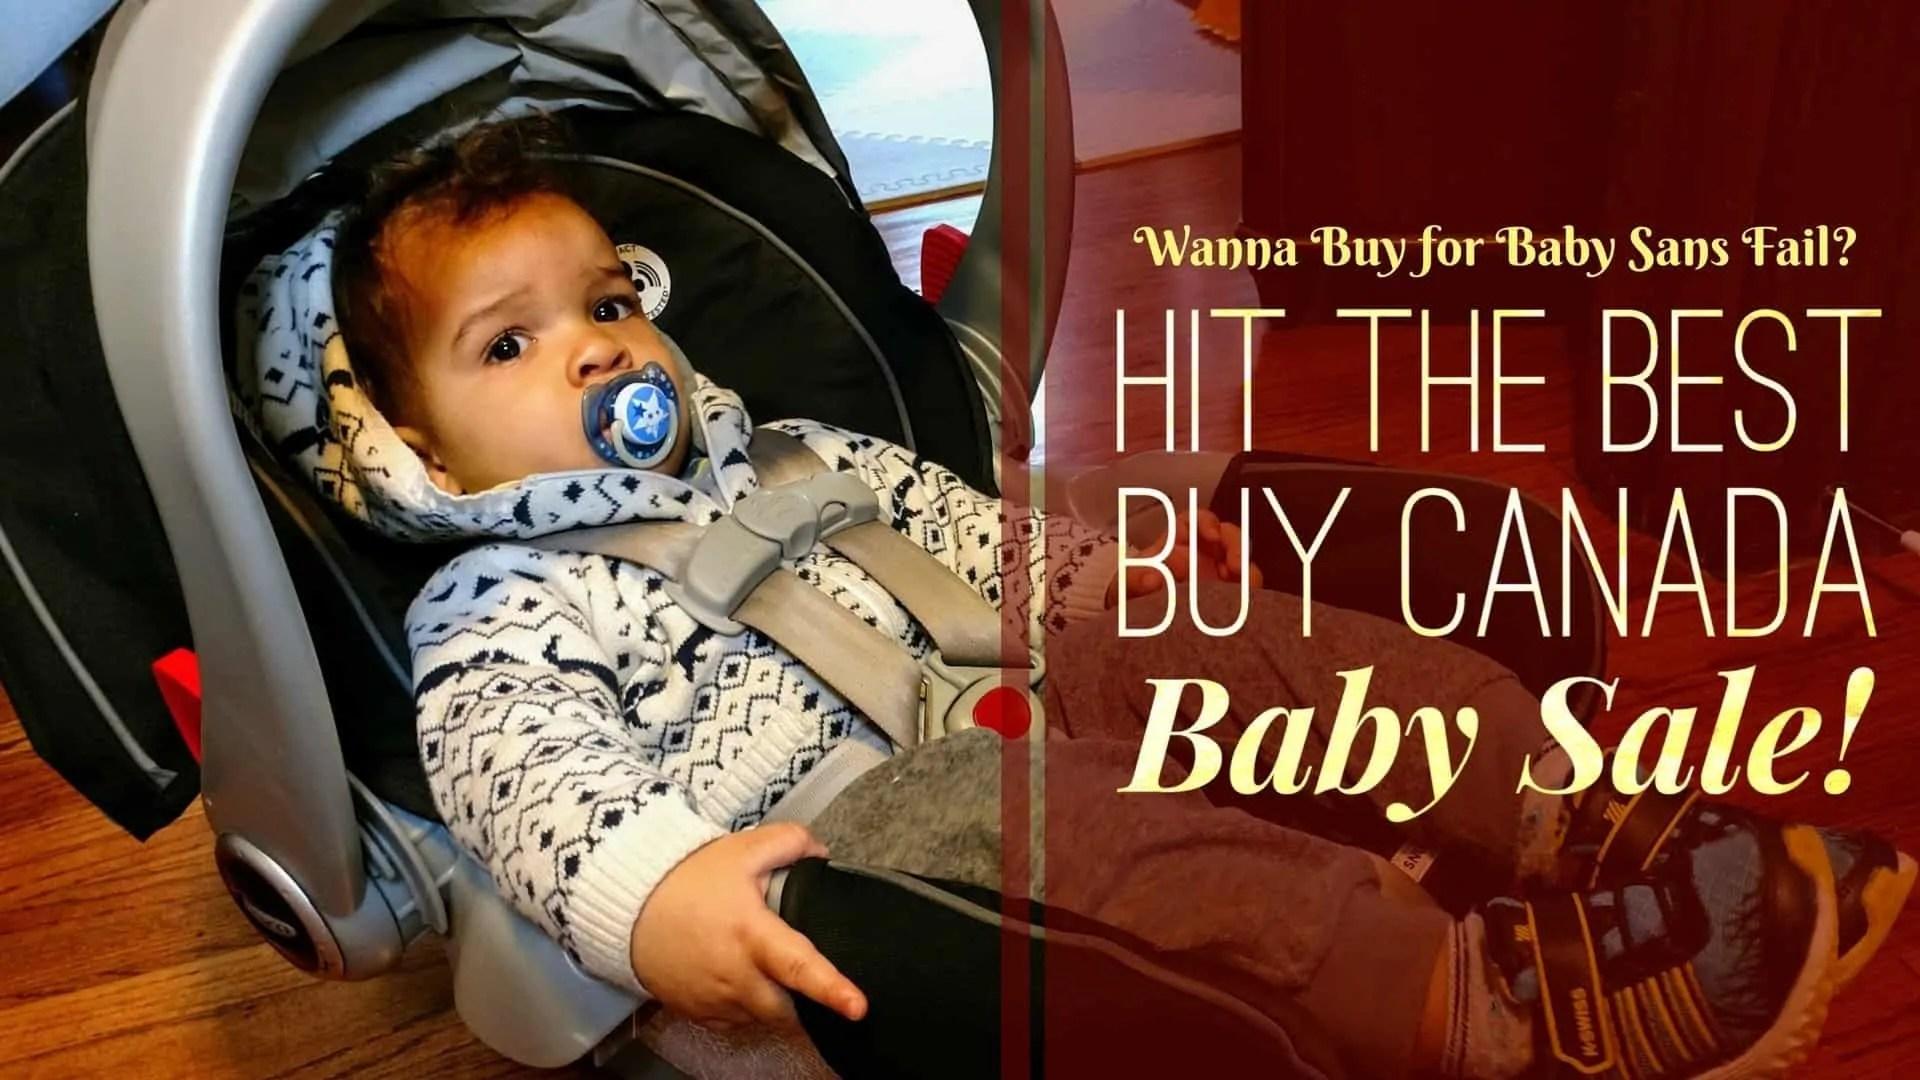 Wanna Buy For Baby Sans Fail Hit The Best Buy Canada Baby Sale